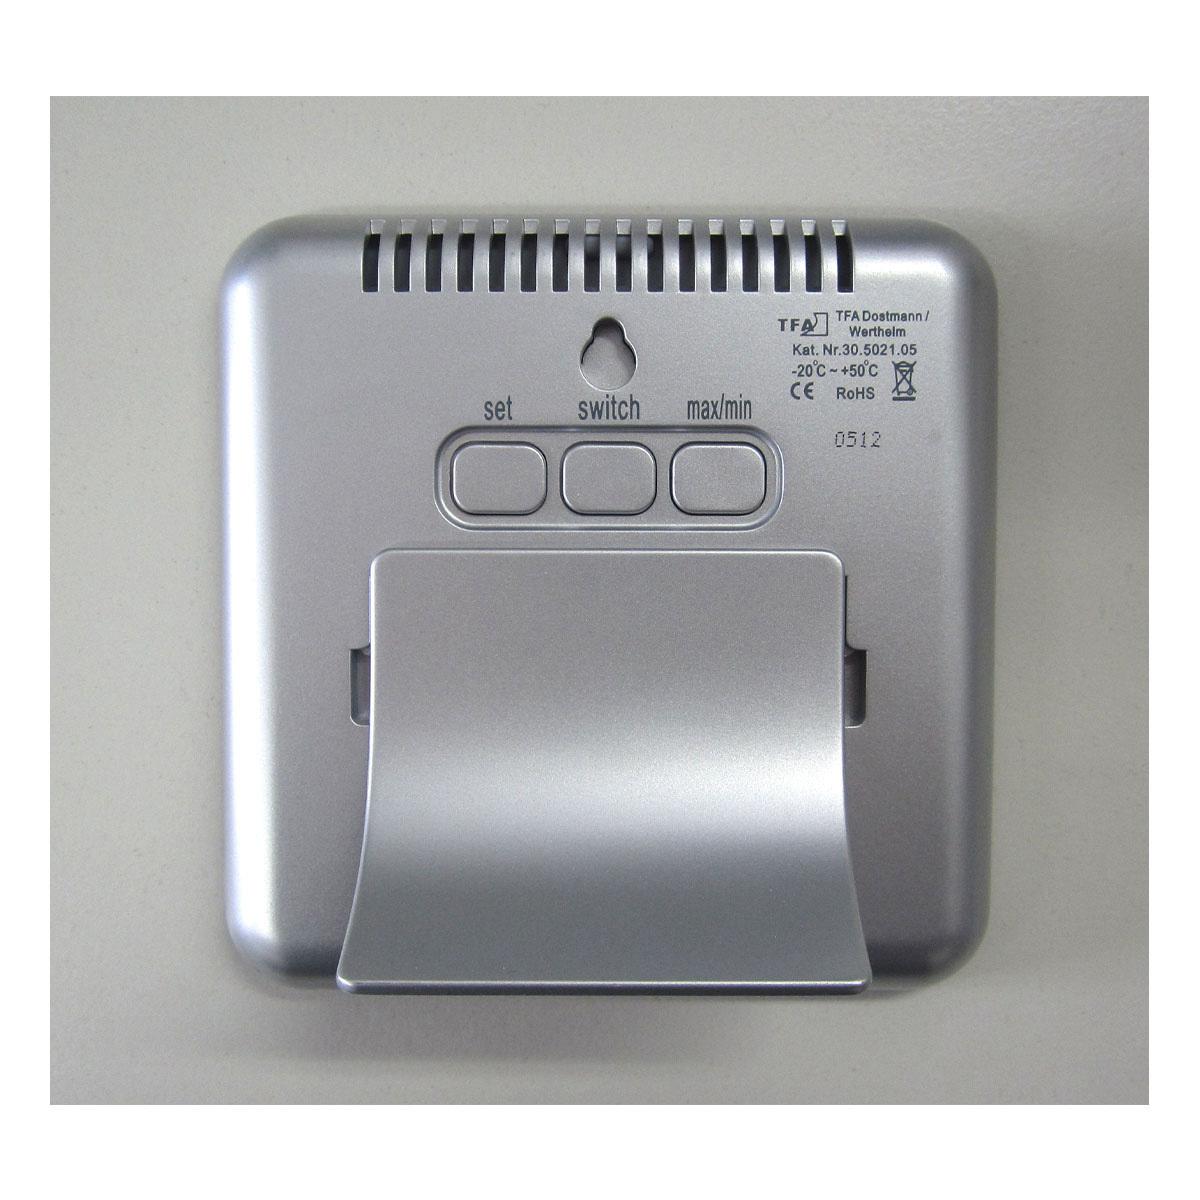 30-5021-05-digitales-thermo-hygrometer-style-ansicht-1200x1200px.jpg